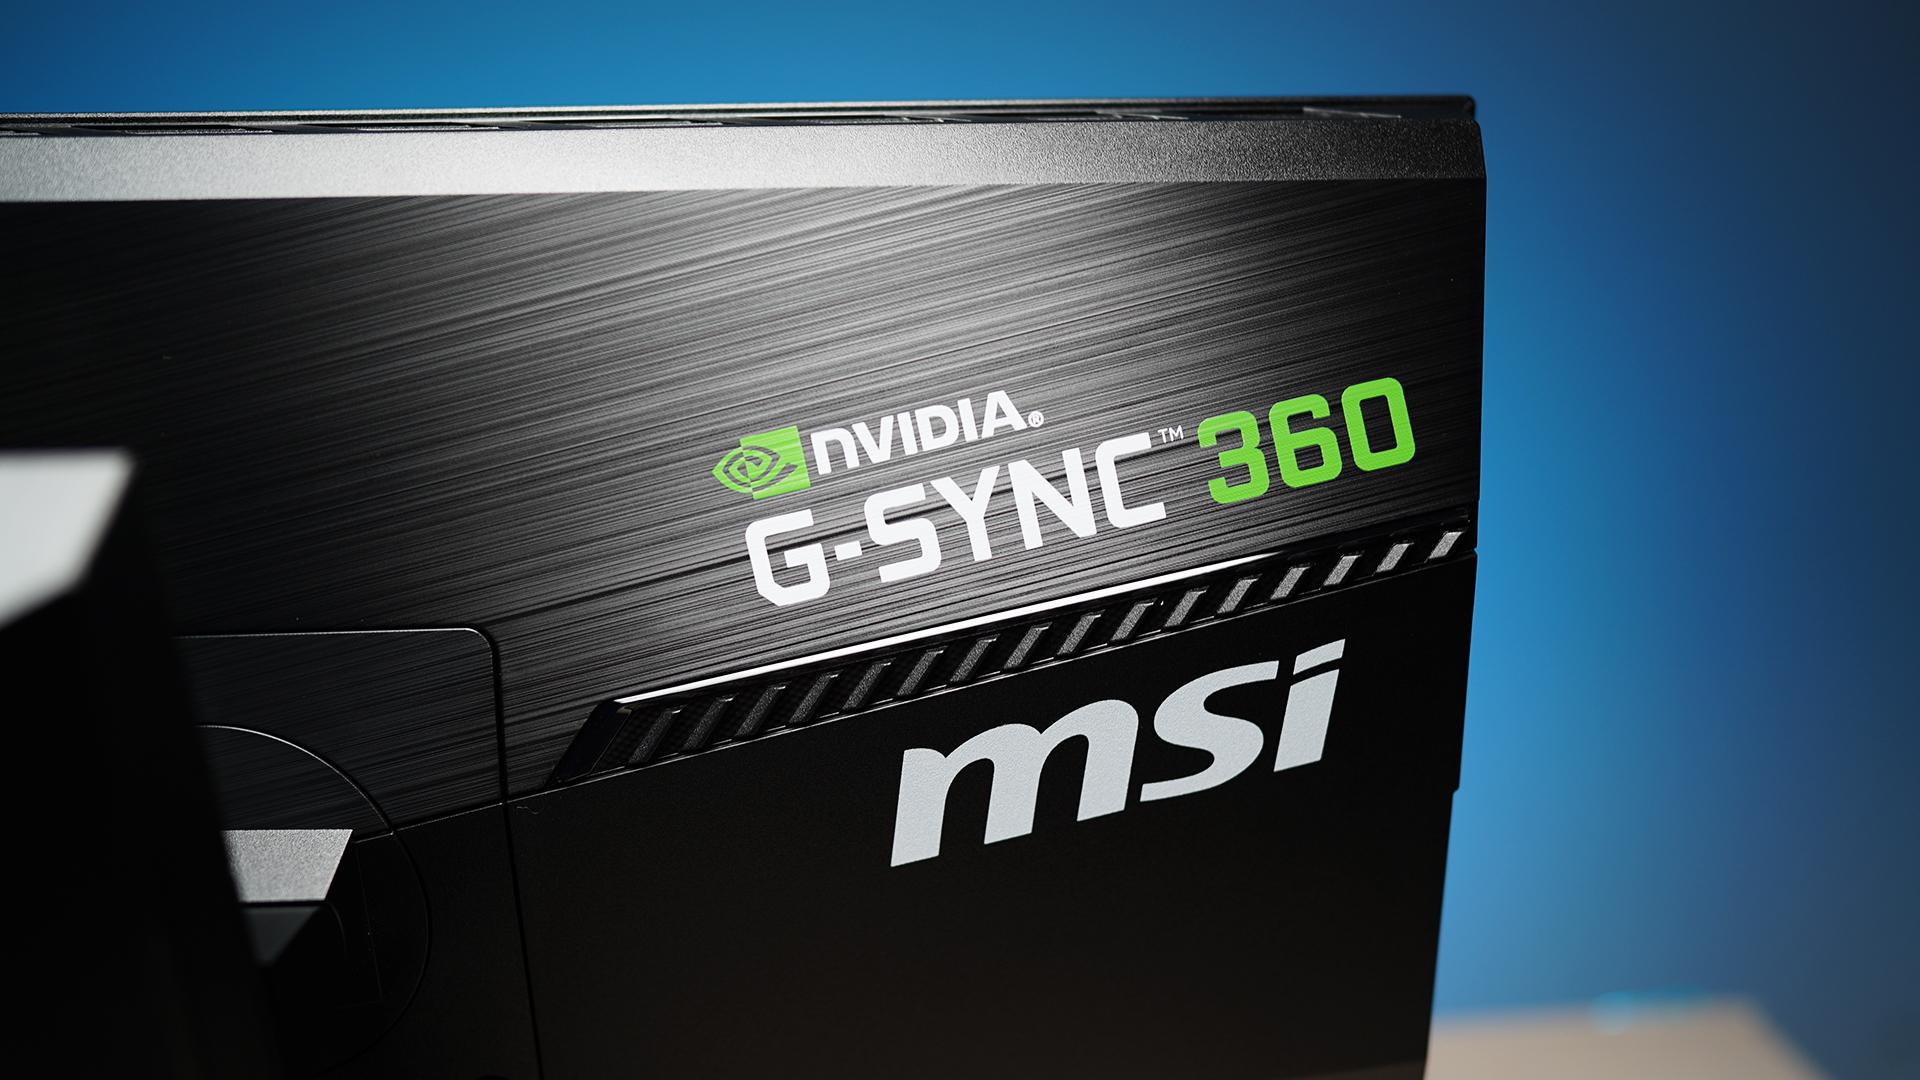 MSI Oculux NXG253R - Design MSI Nvidia G-Sync 360 Logo